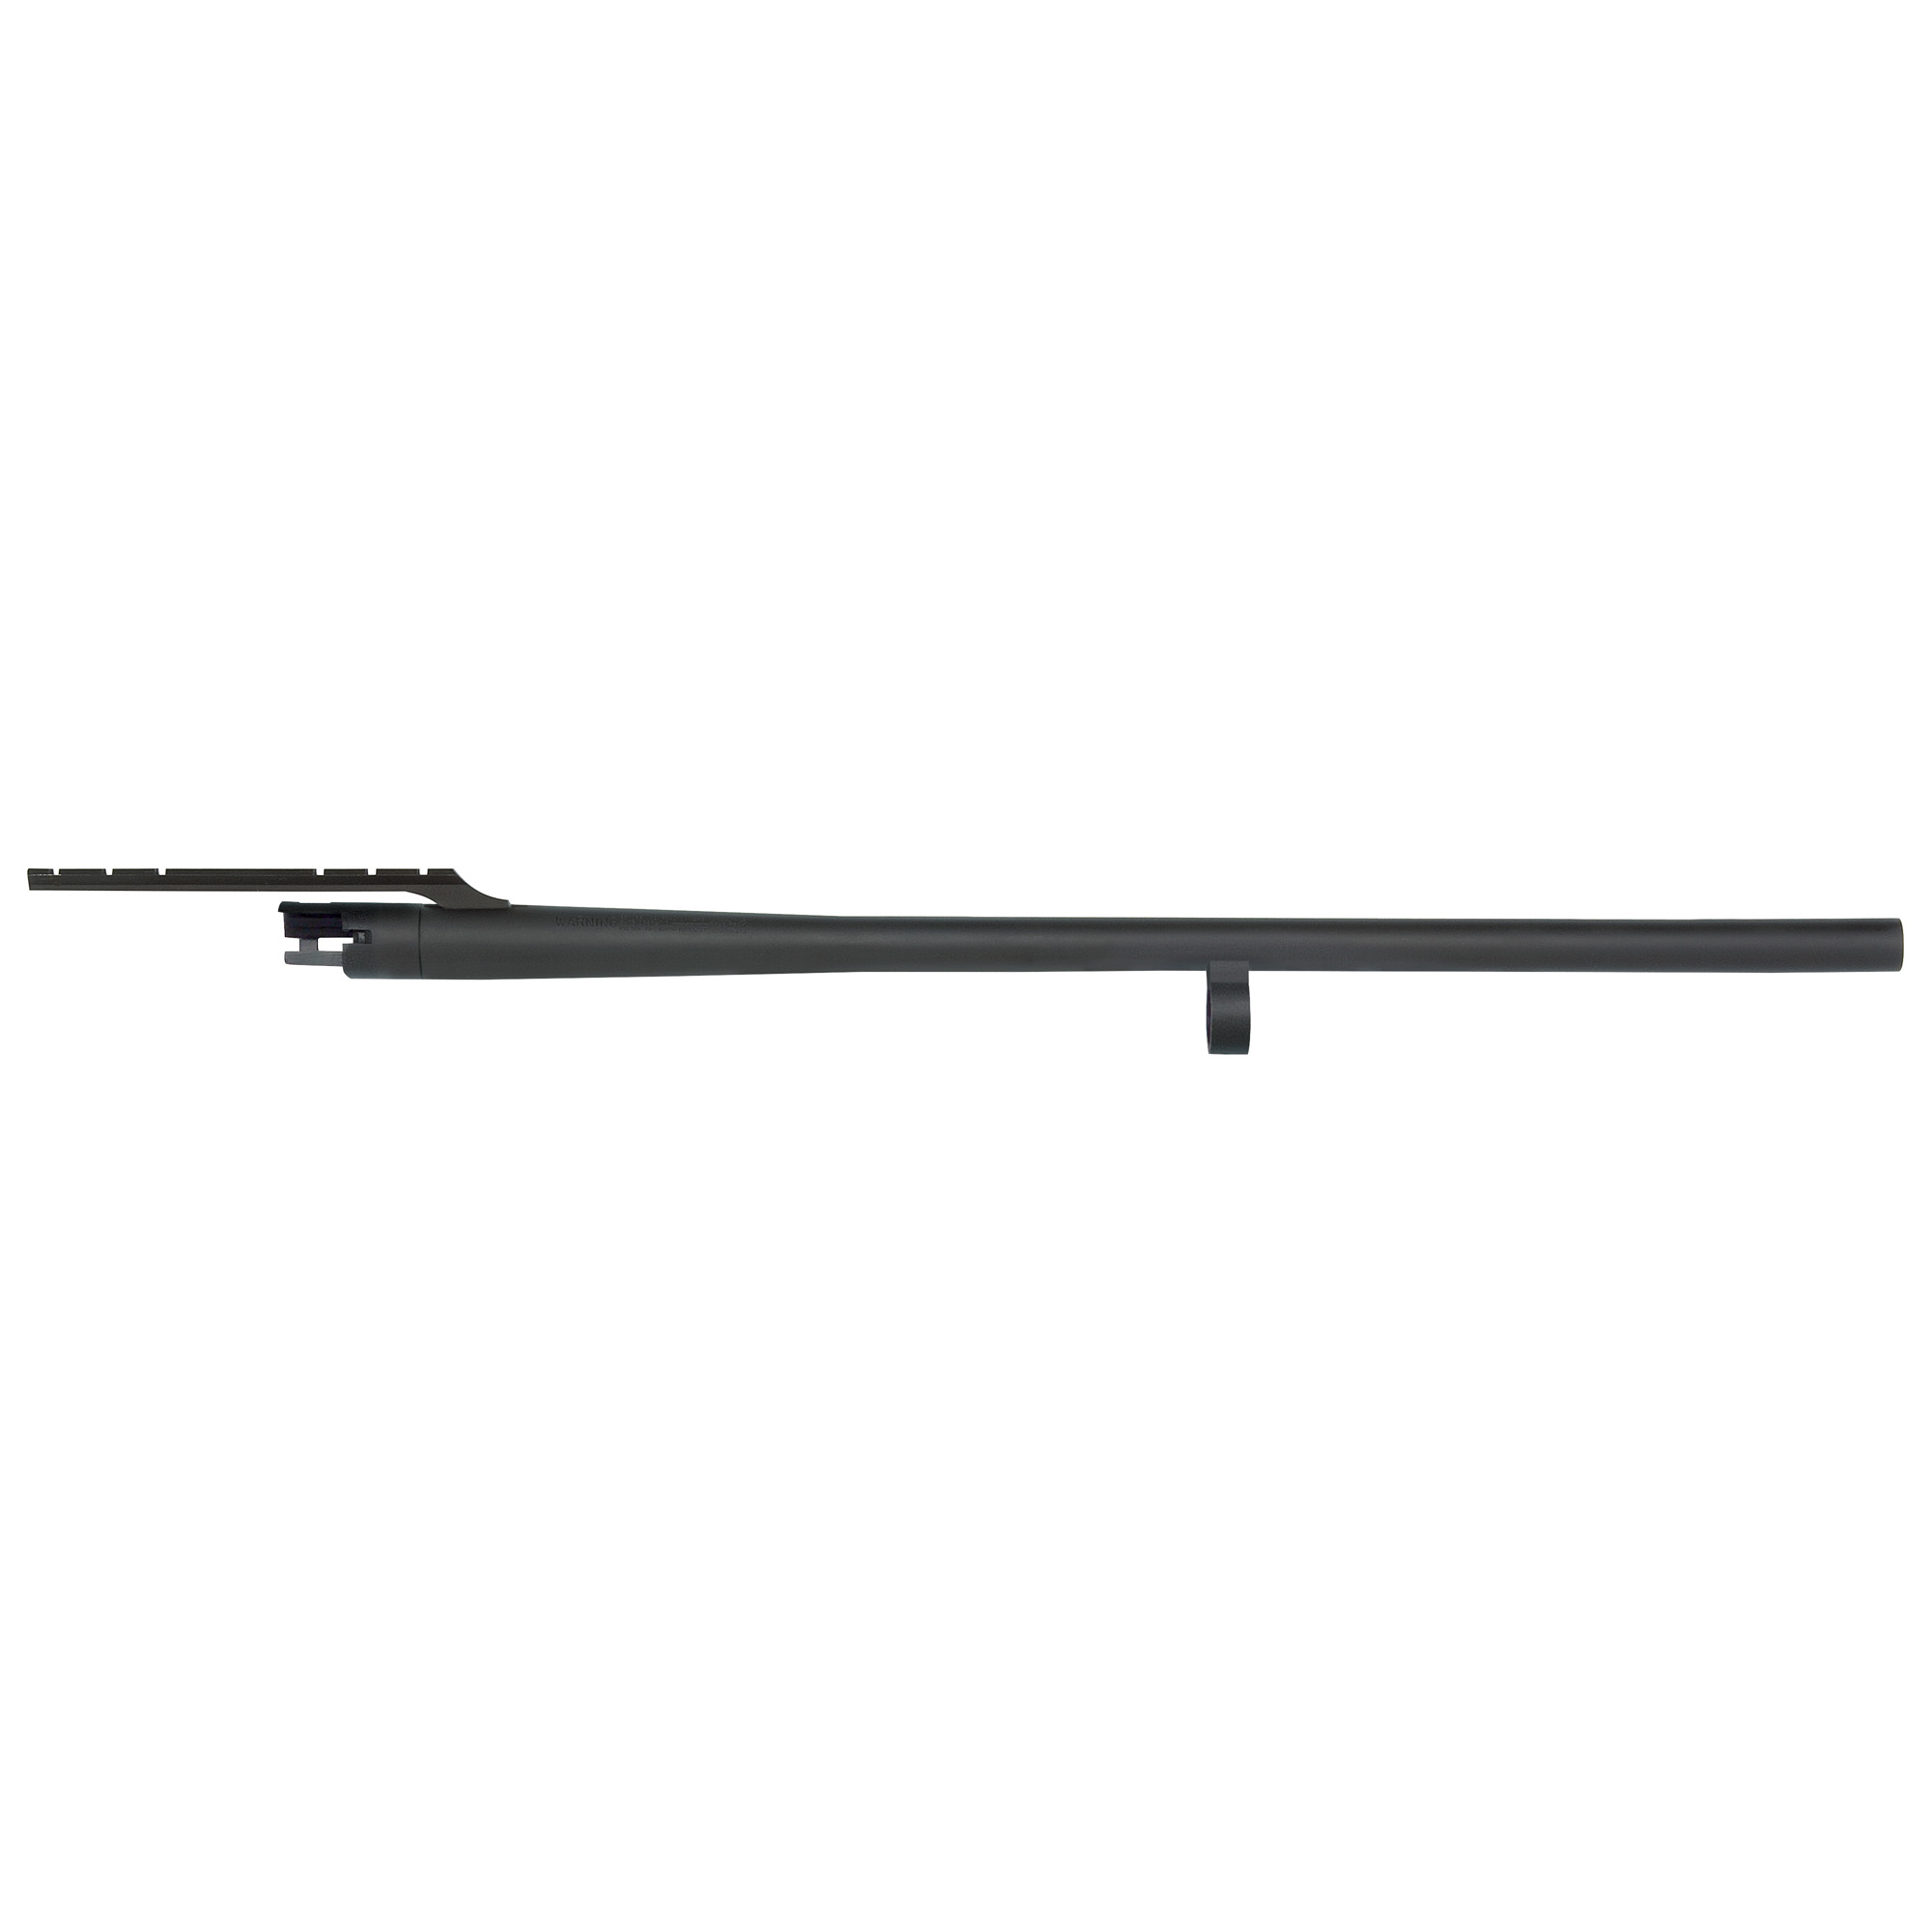 "Remington 870 12 Gauge"" 24"" Slug barrel with cantilever mount"" fully-rifled bore"" and matte blued finish."